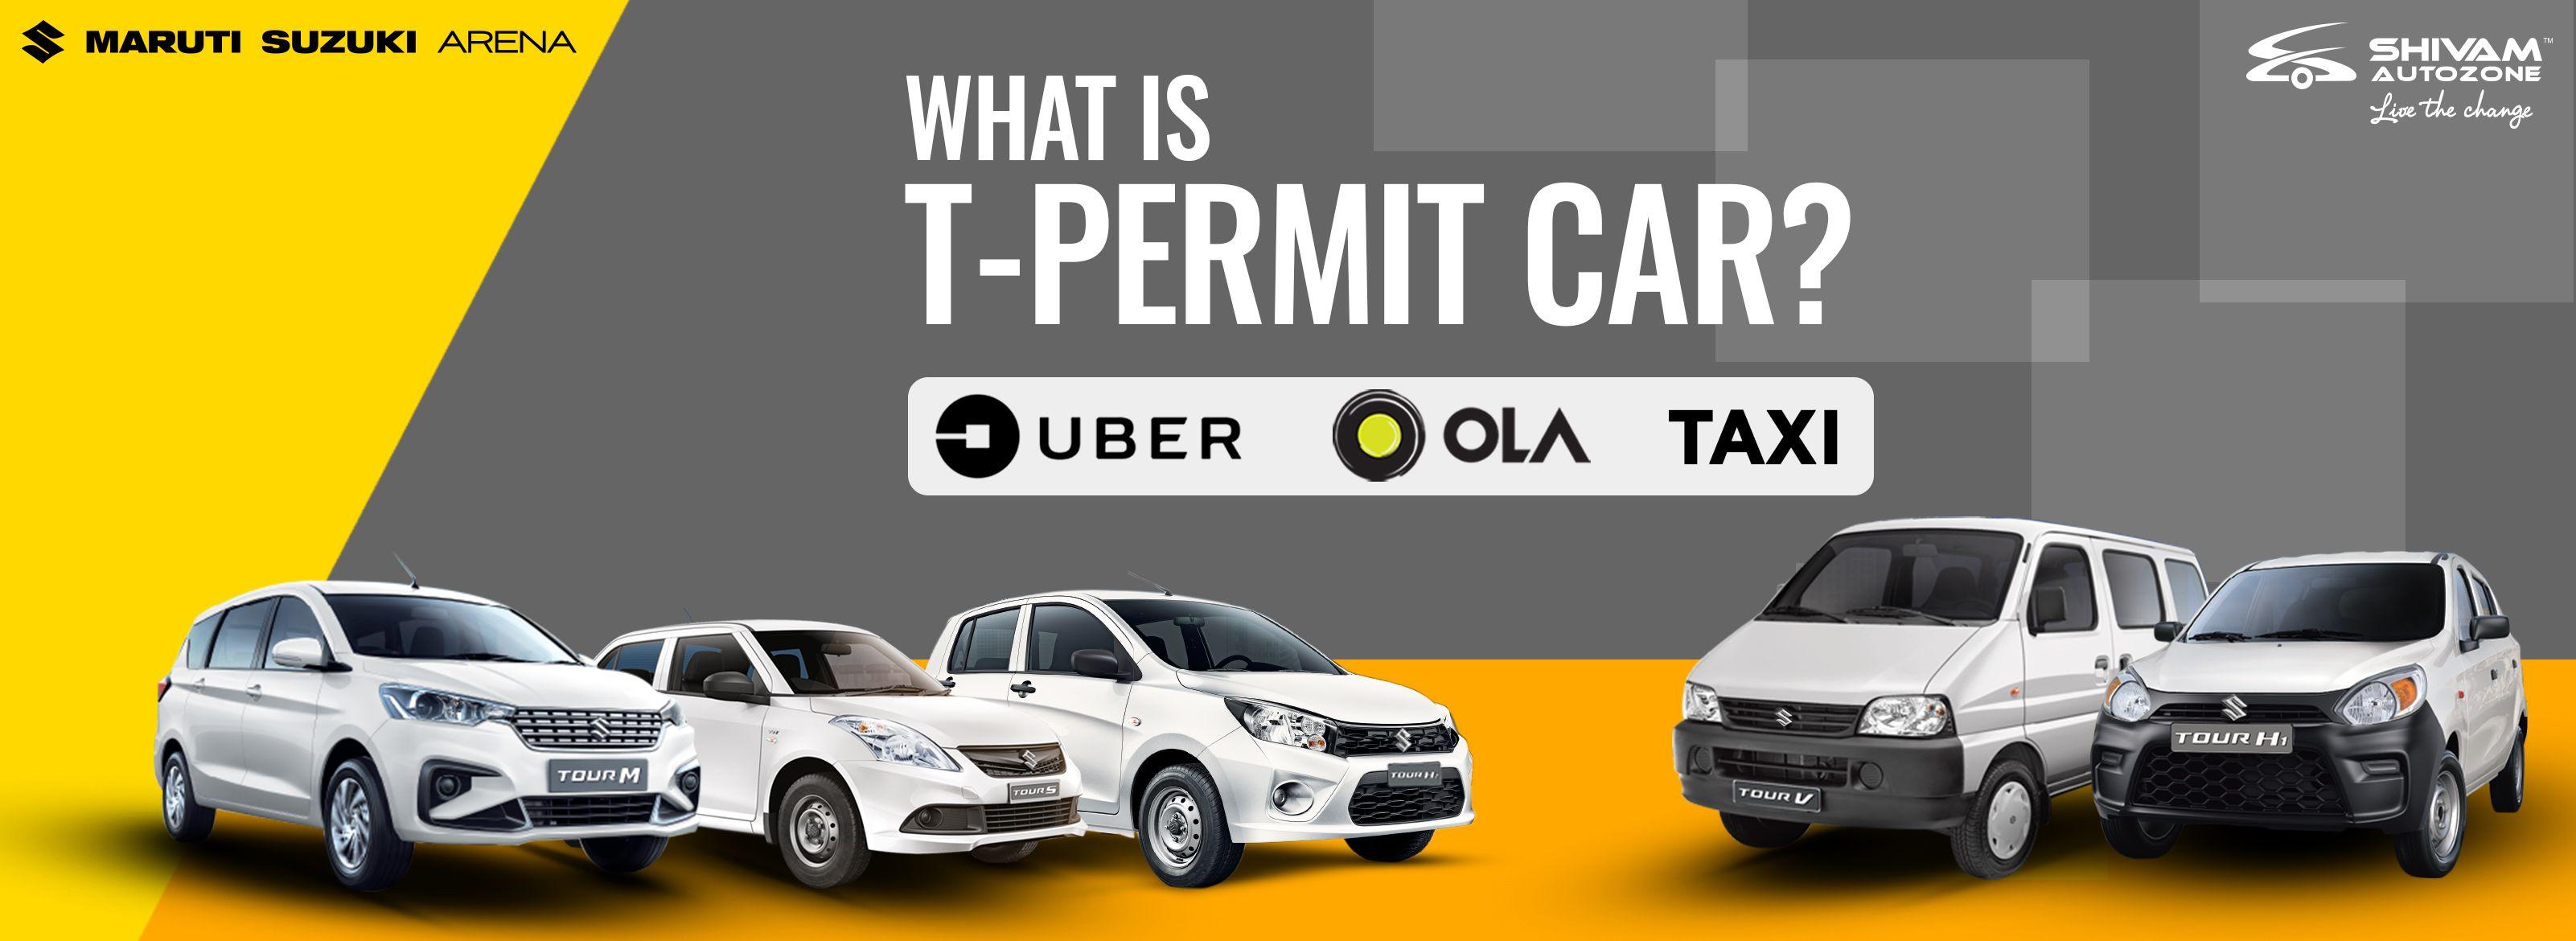 What Is A T Permit Car In 2020 Car Car Model Suzuki